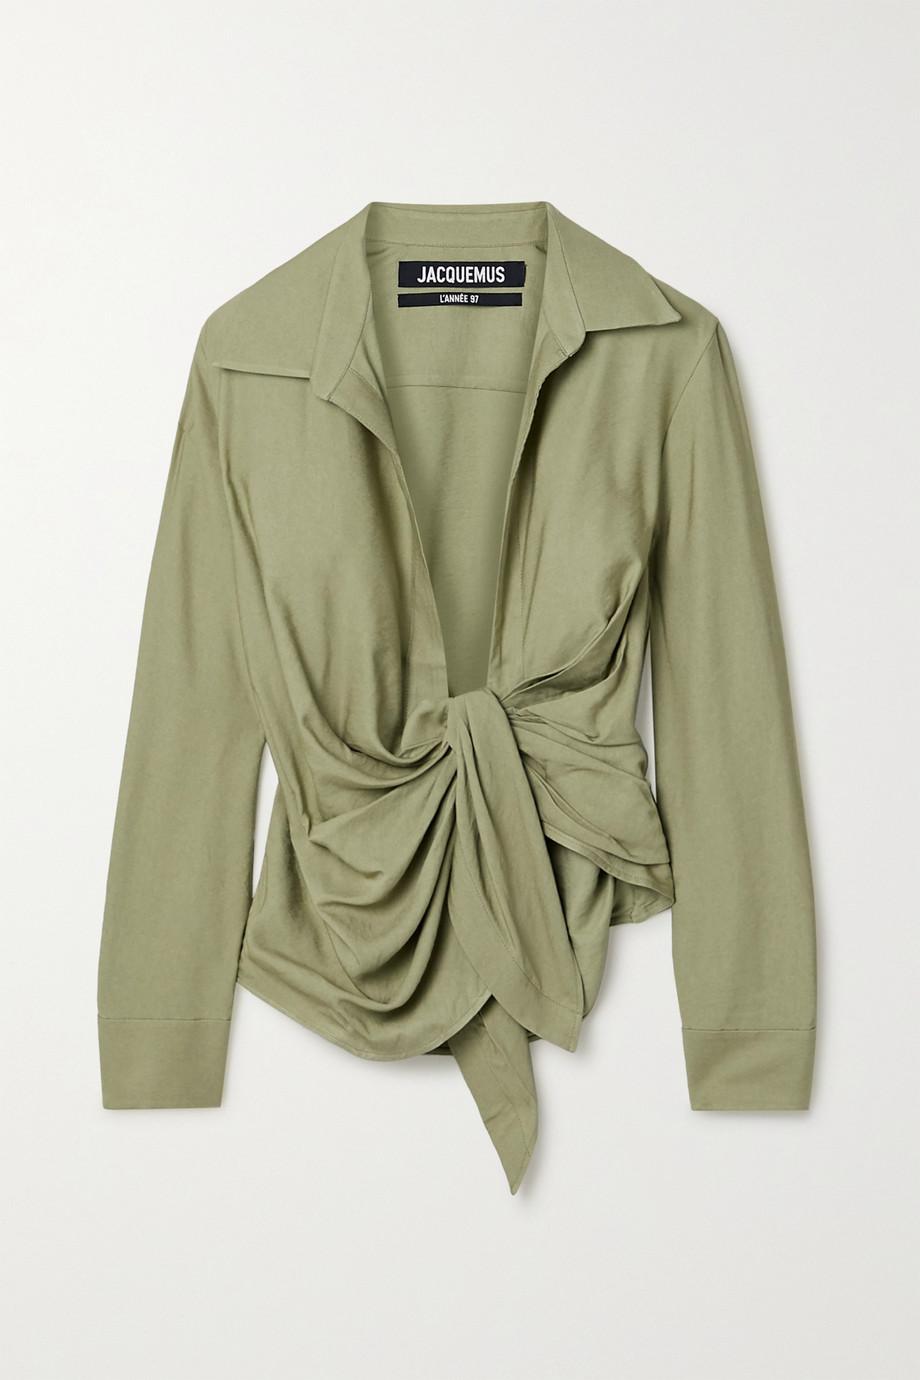 Jacquemus Bahia tie-front twill shirt